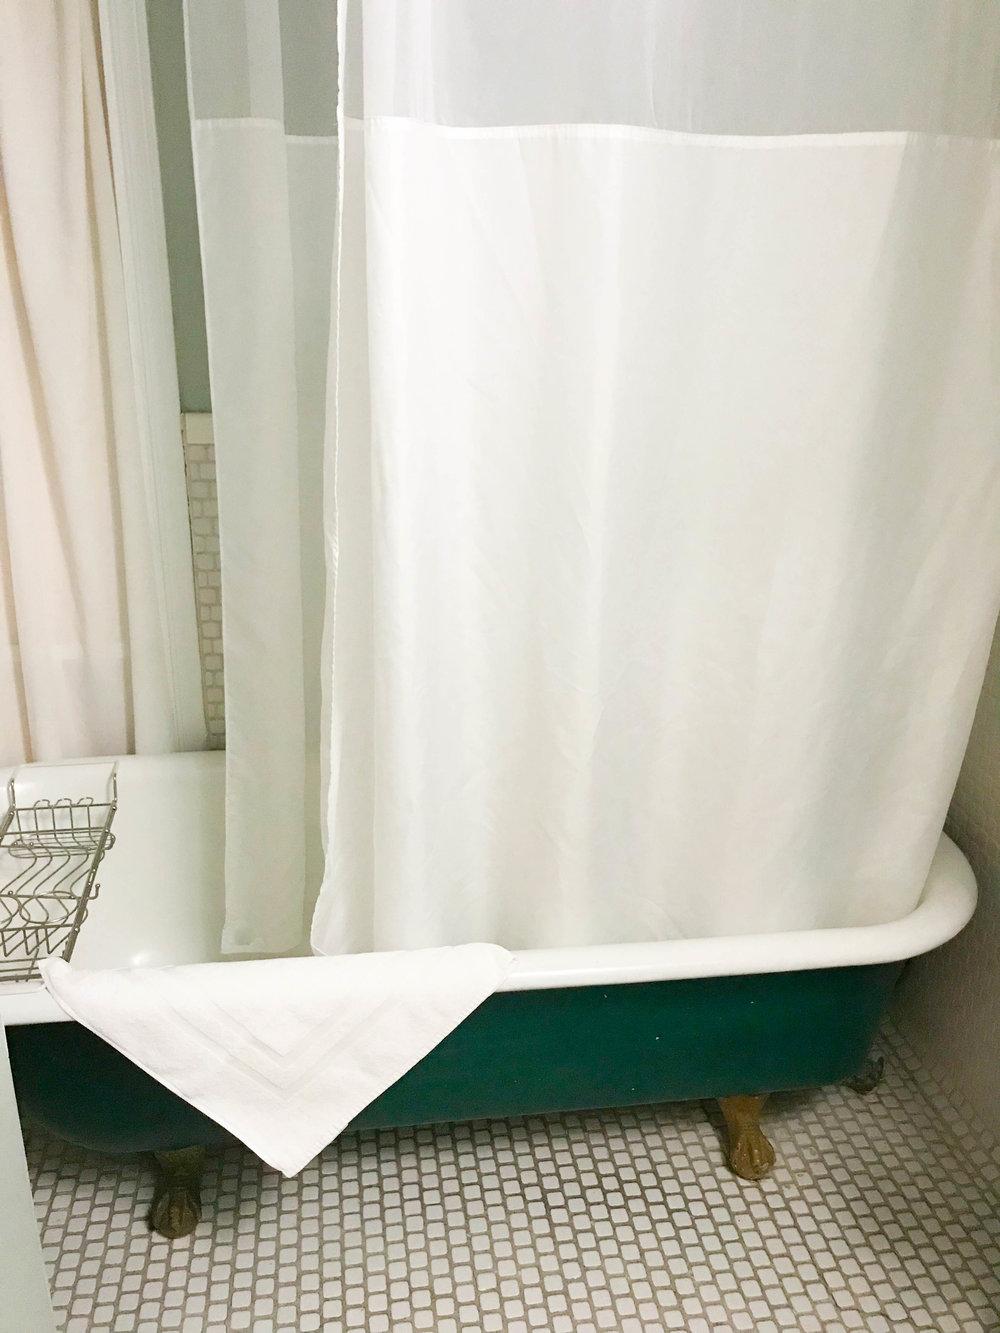 Cabernet House - Old World Inn Bathroom Starry Night Footed Tub